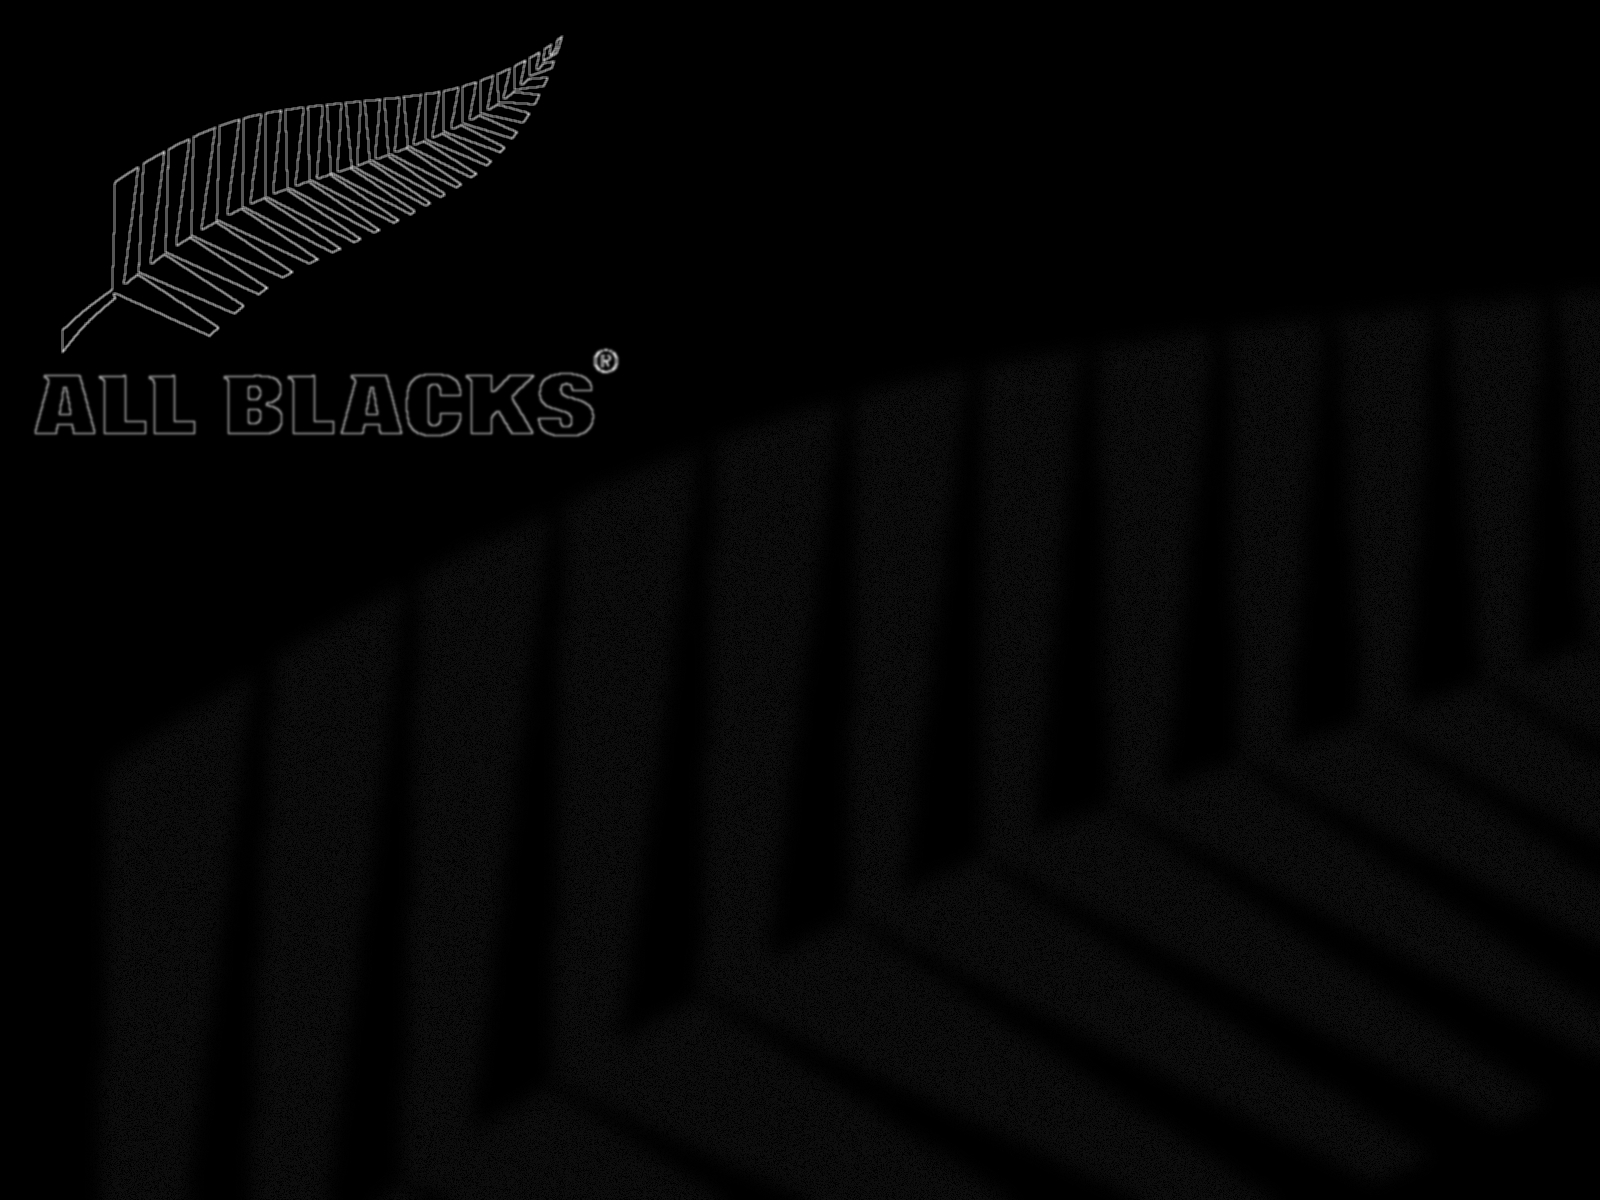 black wallpaper hd All Blacks Wallpaper 1600x1200